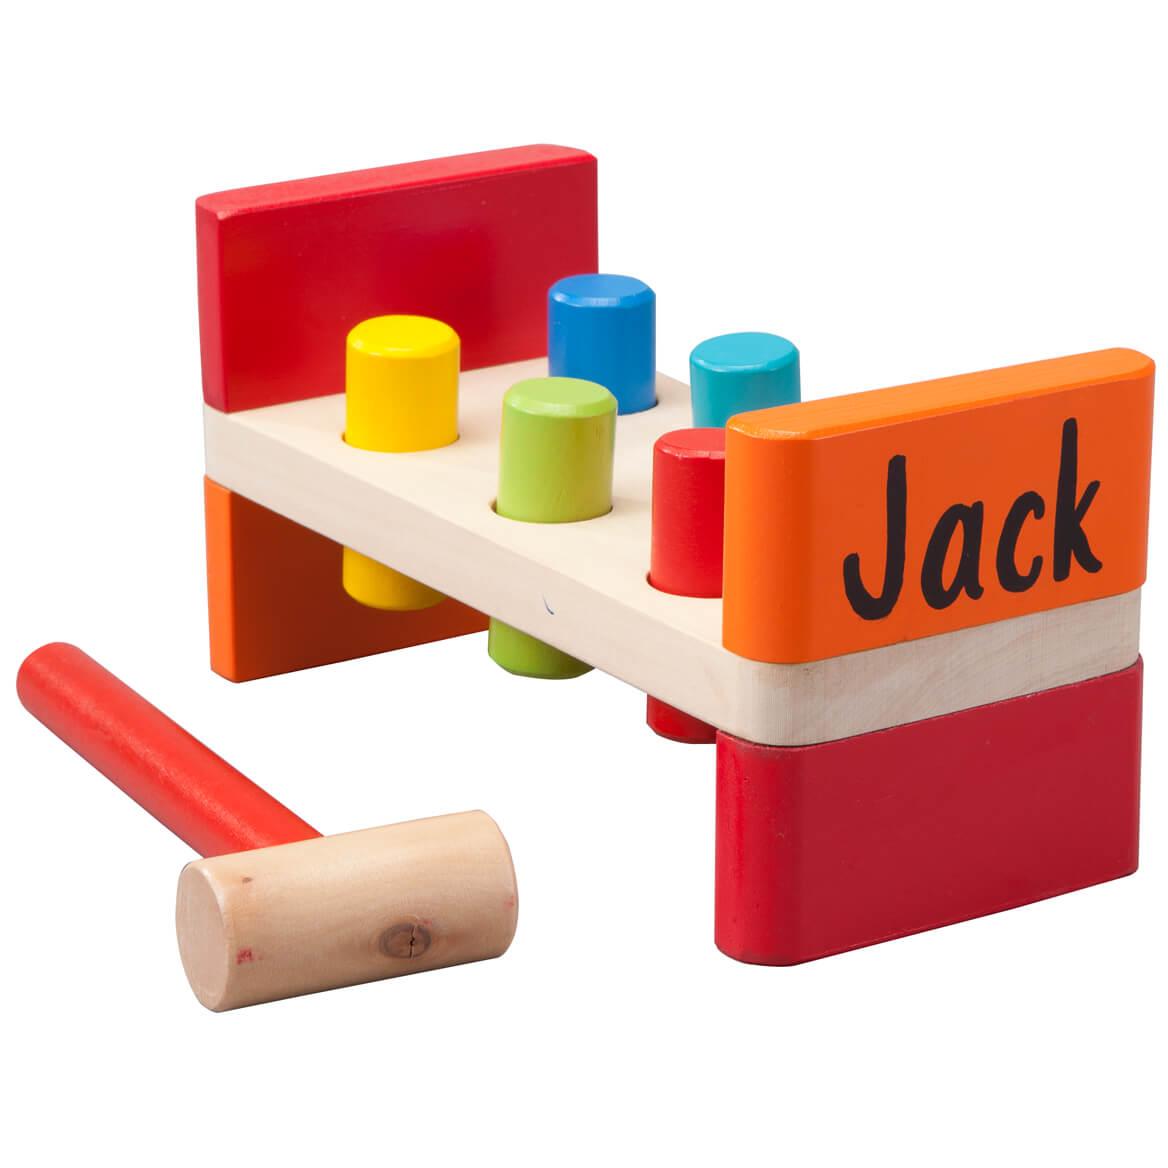 Personalized Wood Peg Bench-349421